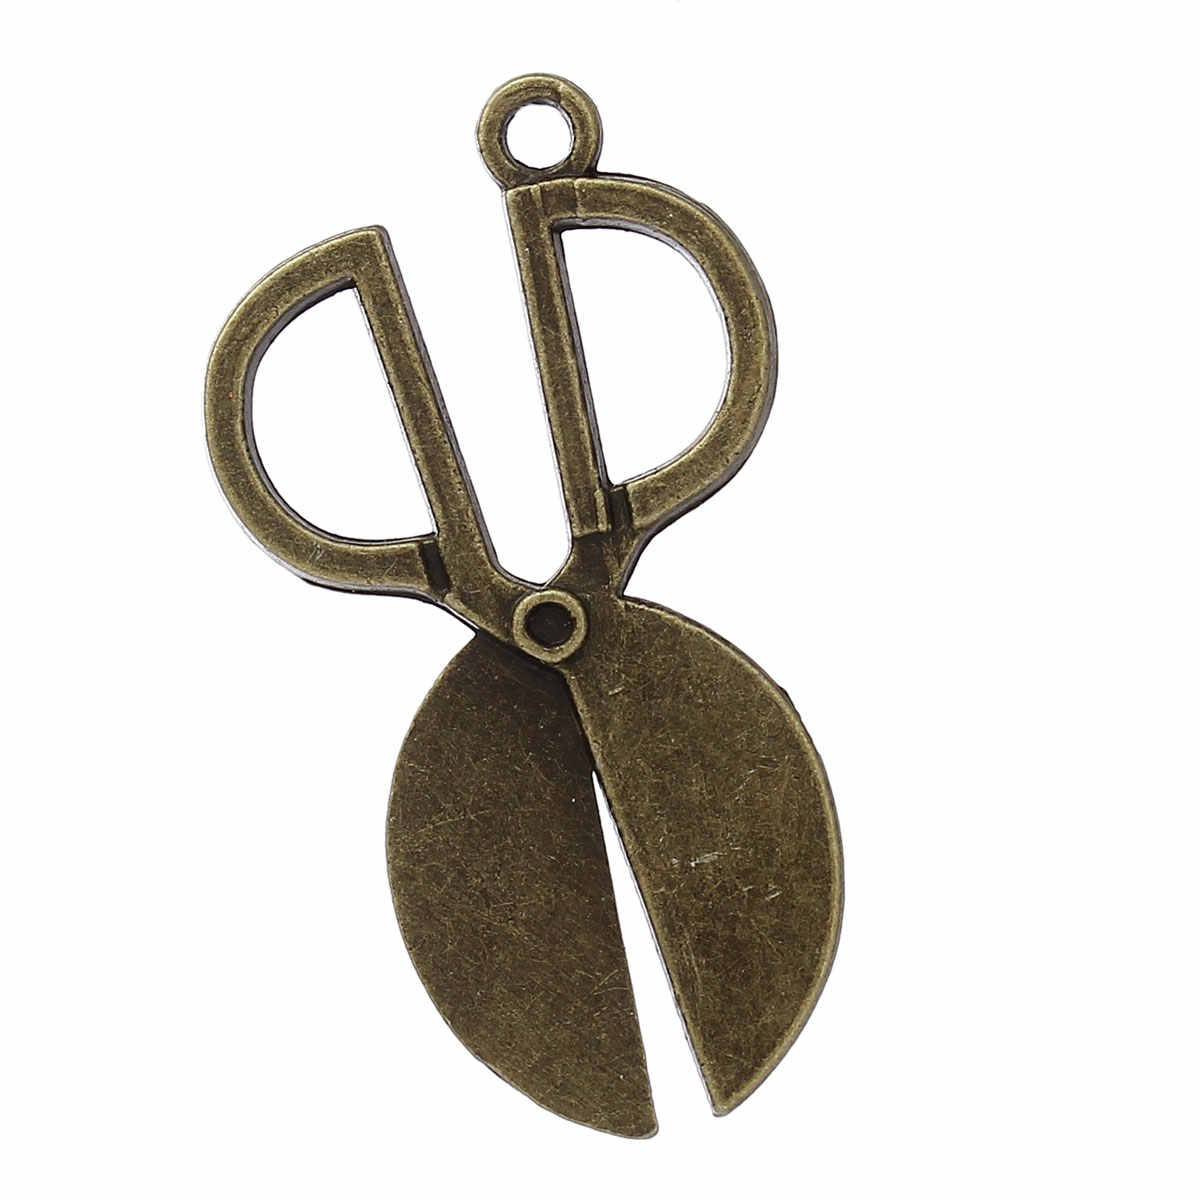 "DoreenBeads Zinc metal alloy Charm Pendants Scissors Antique Bronze 36mm(1 3/8"") x 20mm( 6/8""), 1 Piece 2017 new"